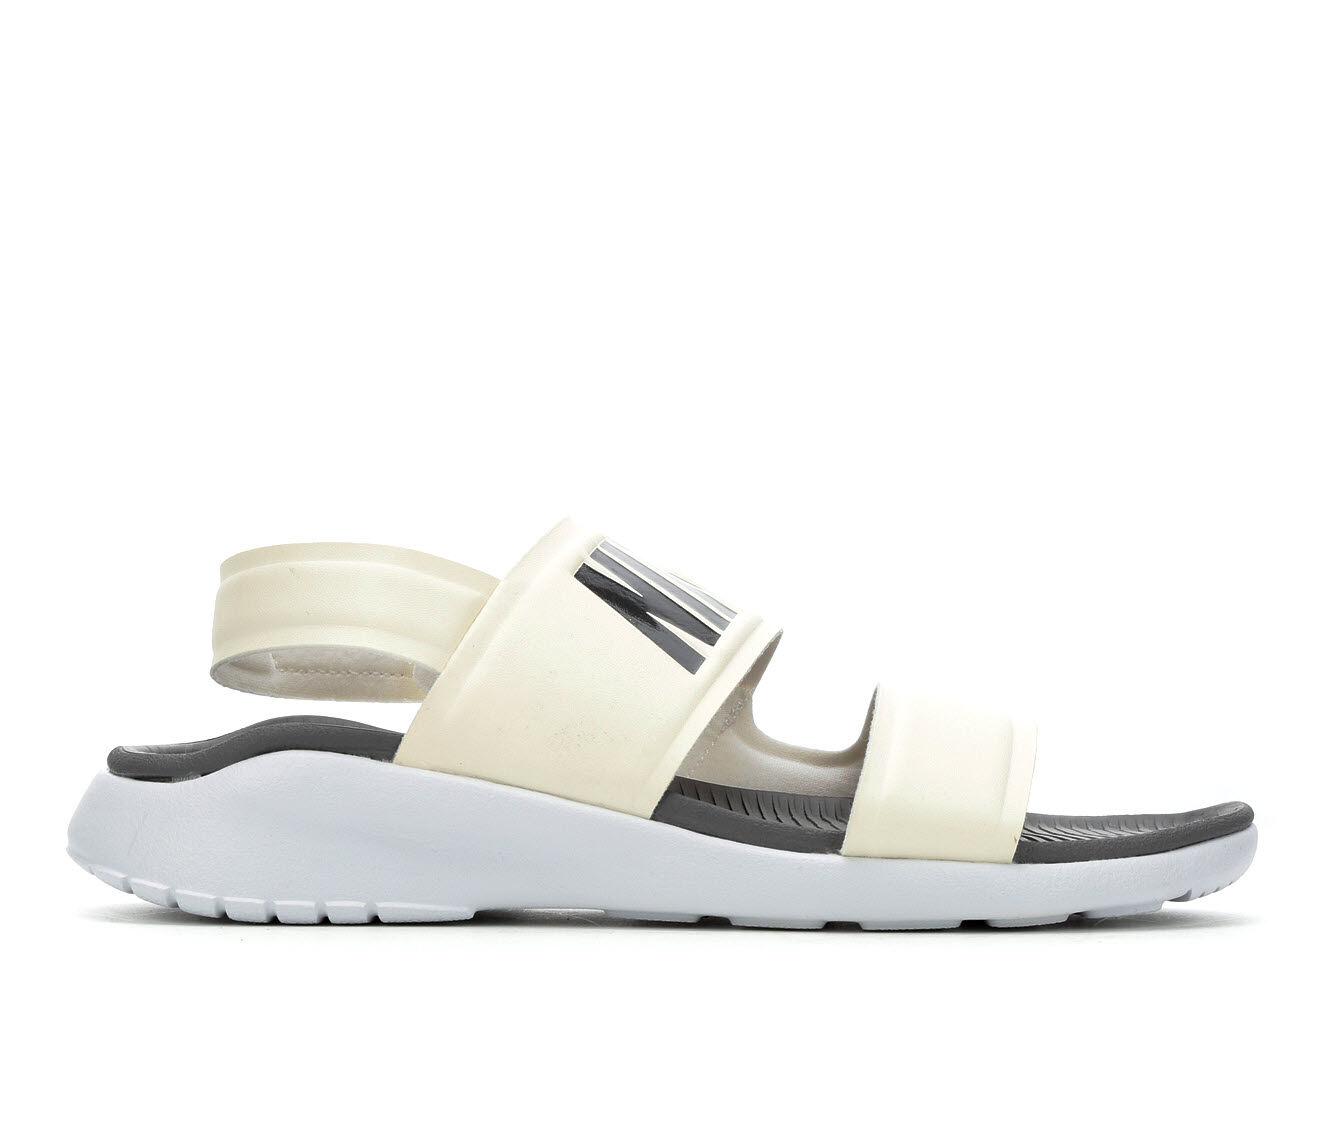 uk shoes_kd6804